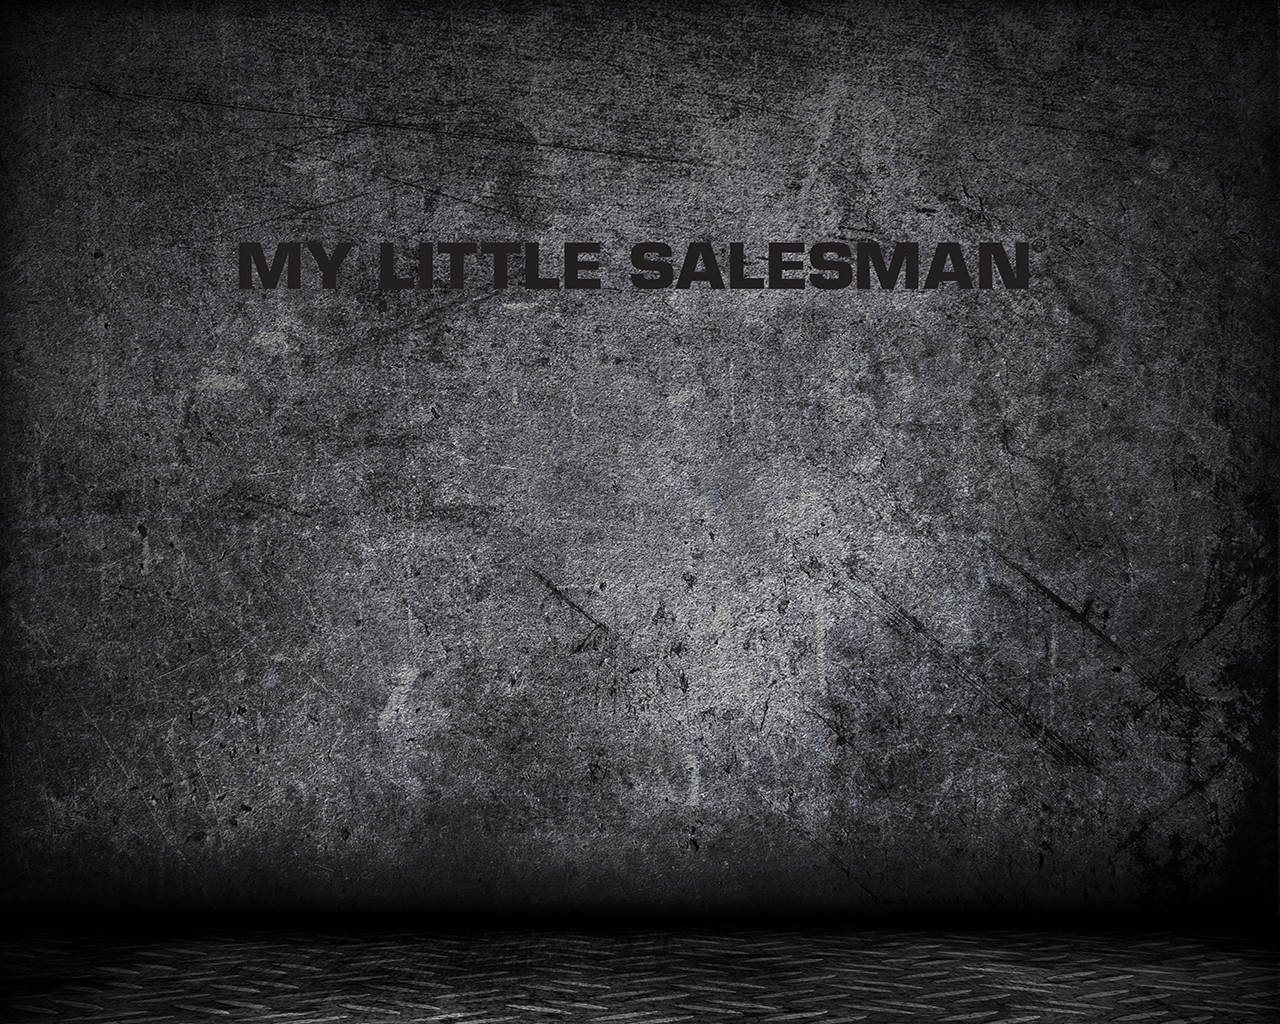 Heavy Equipment Online Classifieds | Buy & Sell | My Little Salesman